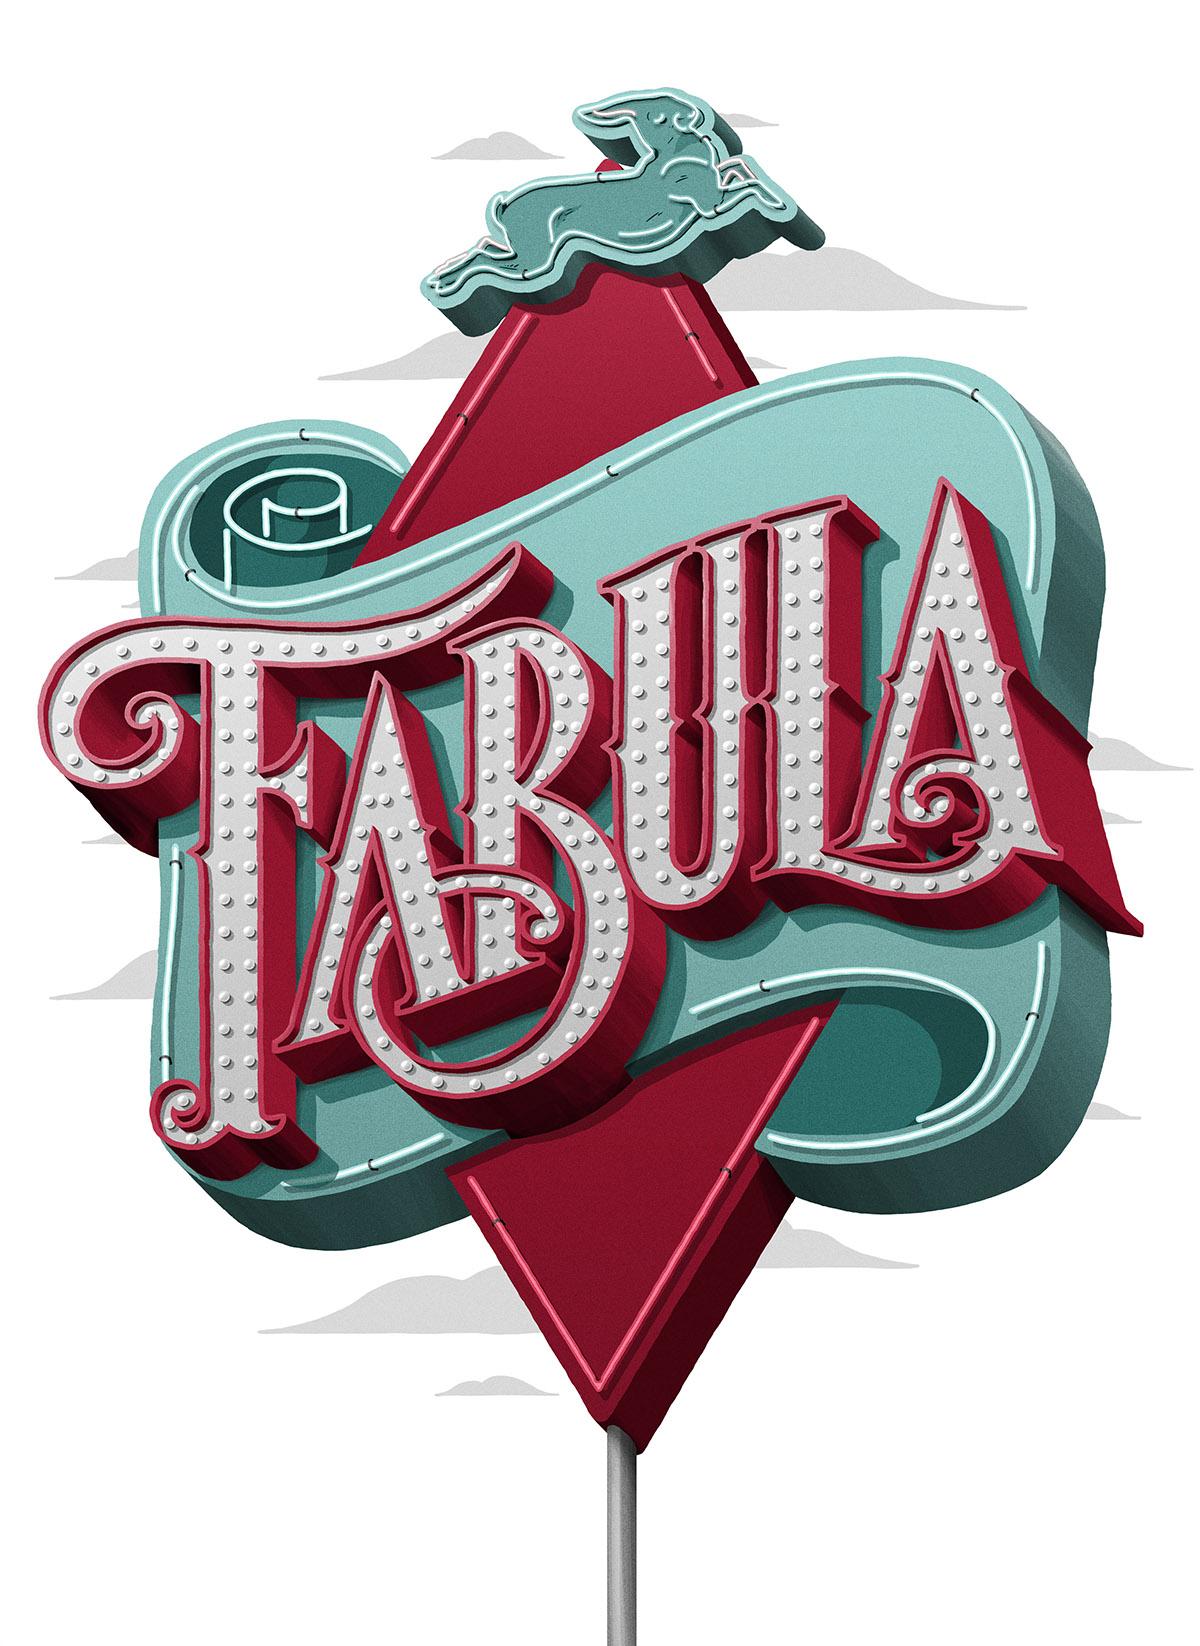 FABULA_TYRSA04_RVB